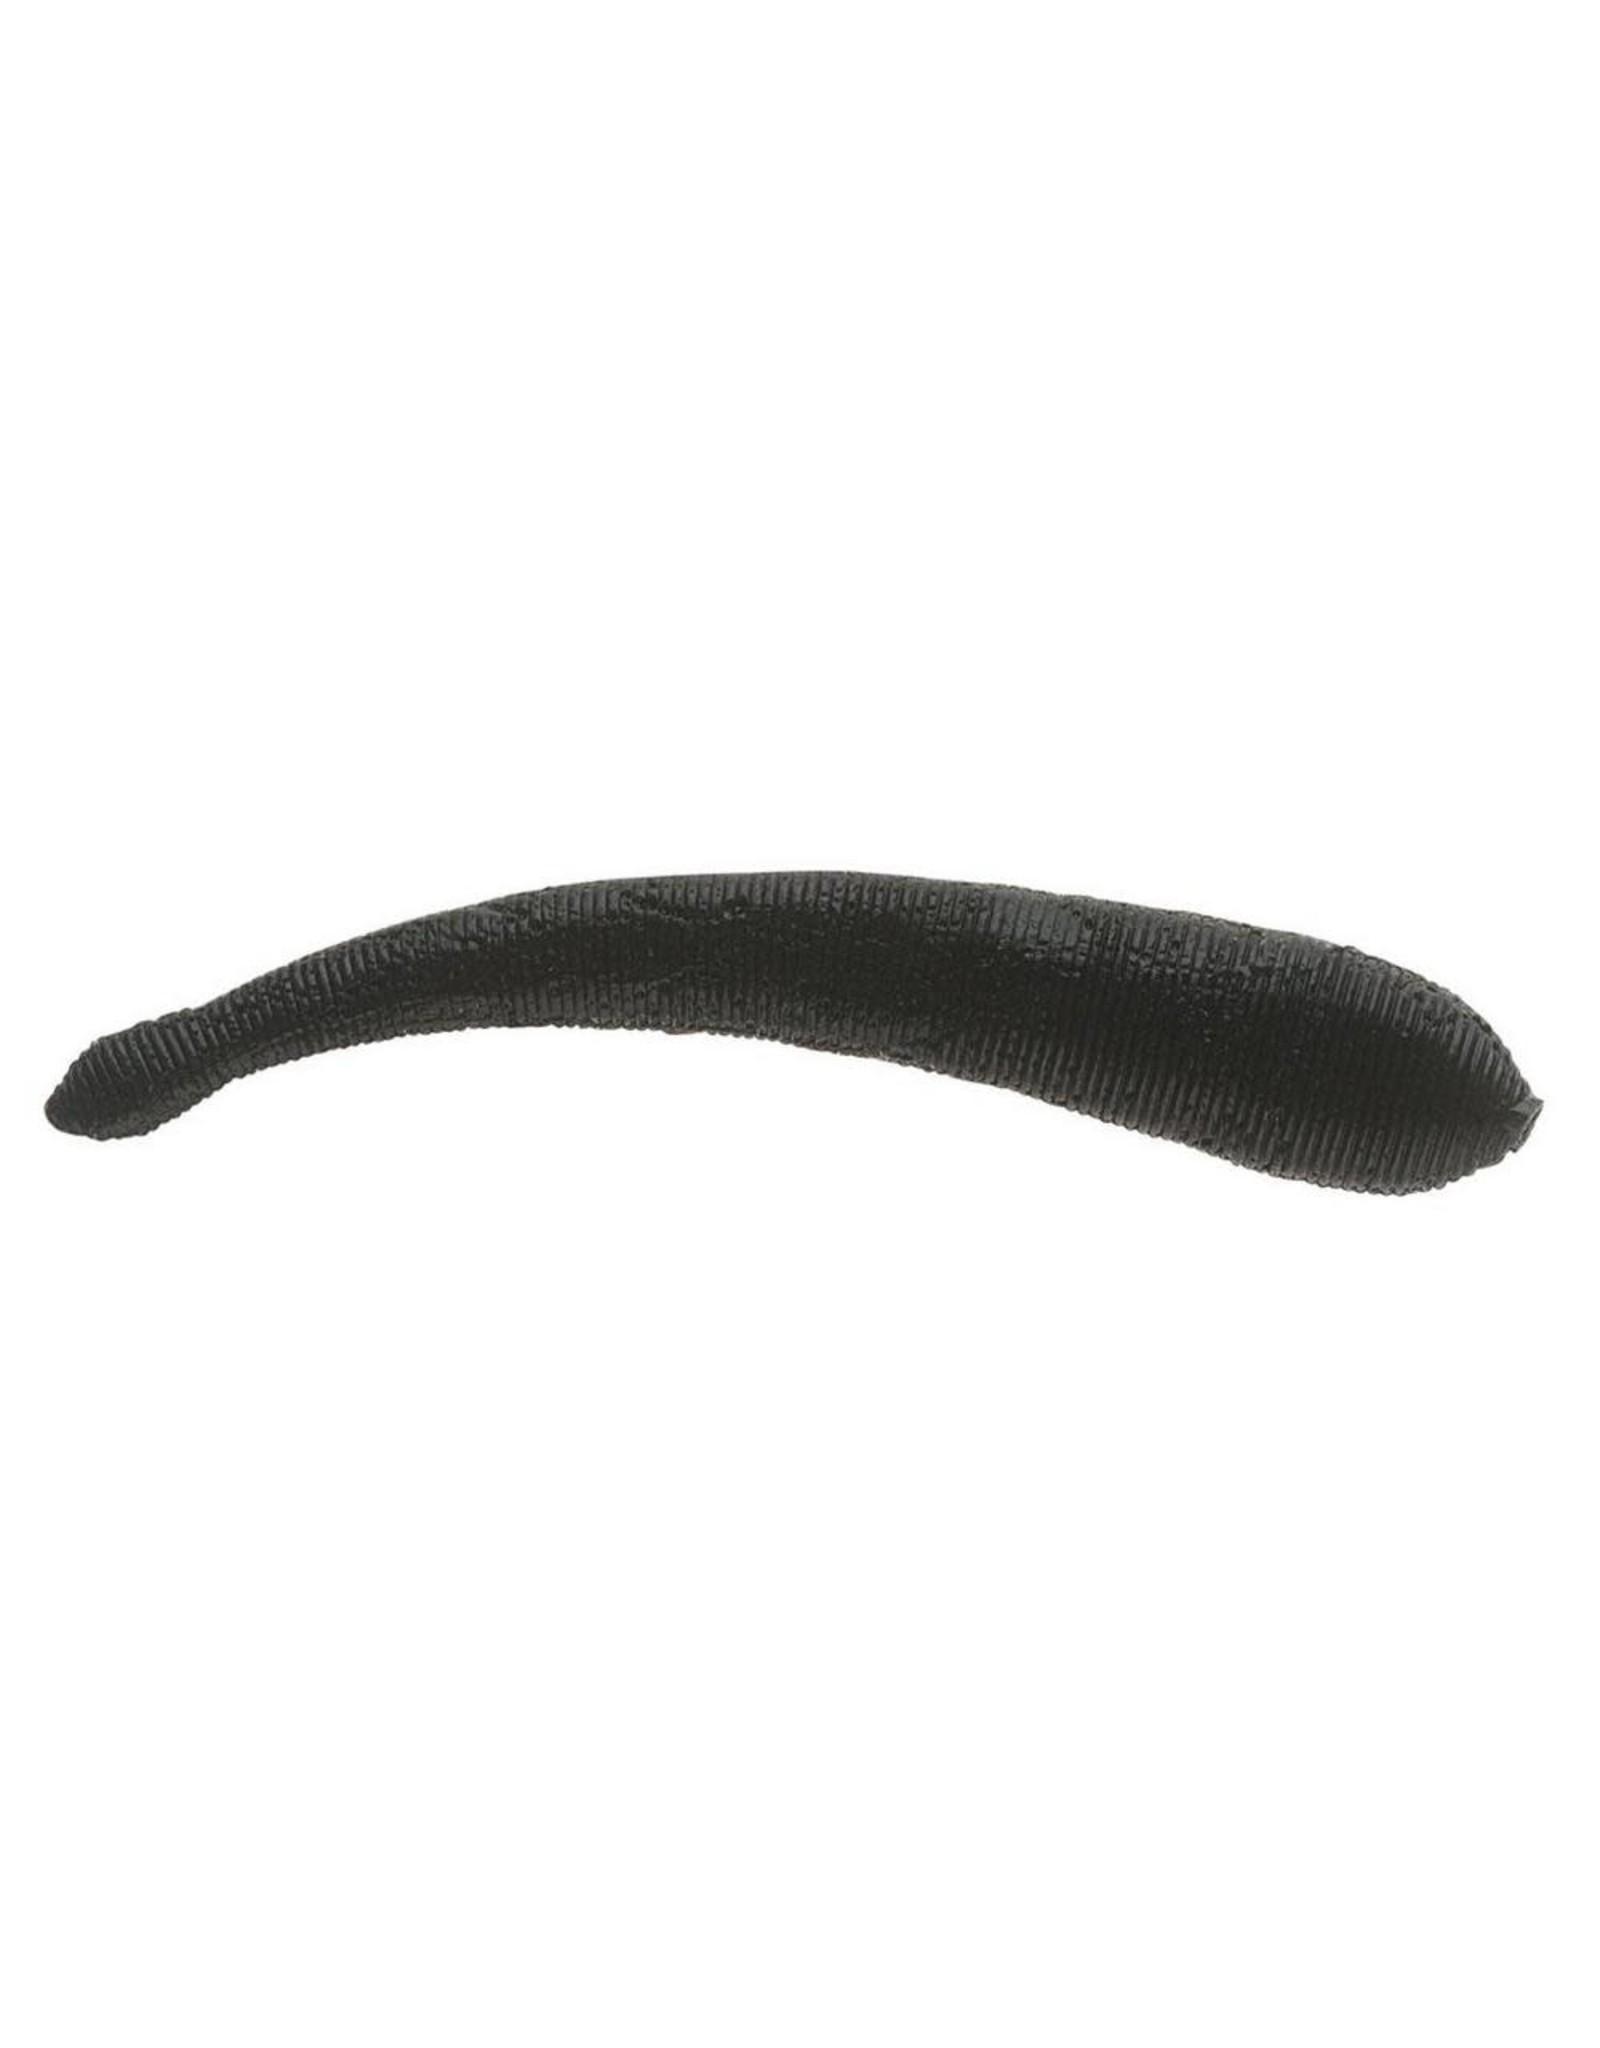 Berkley Fishing Gulp! 3 inch Leech